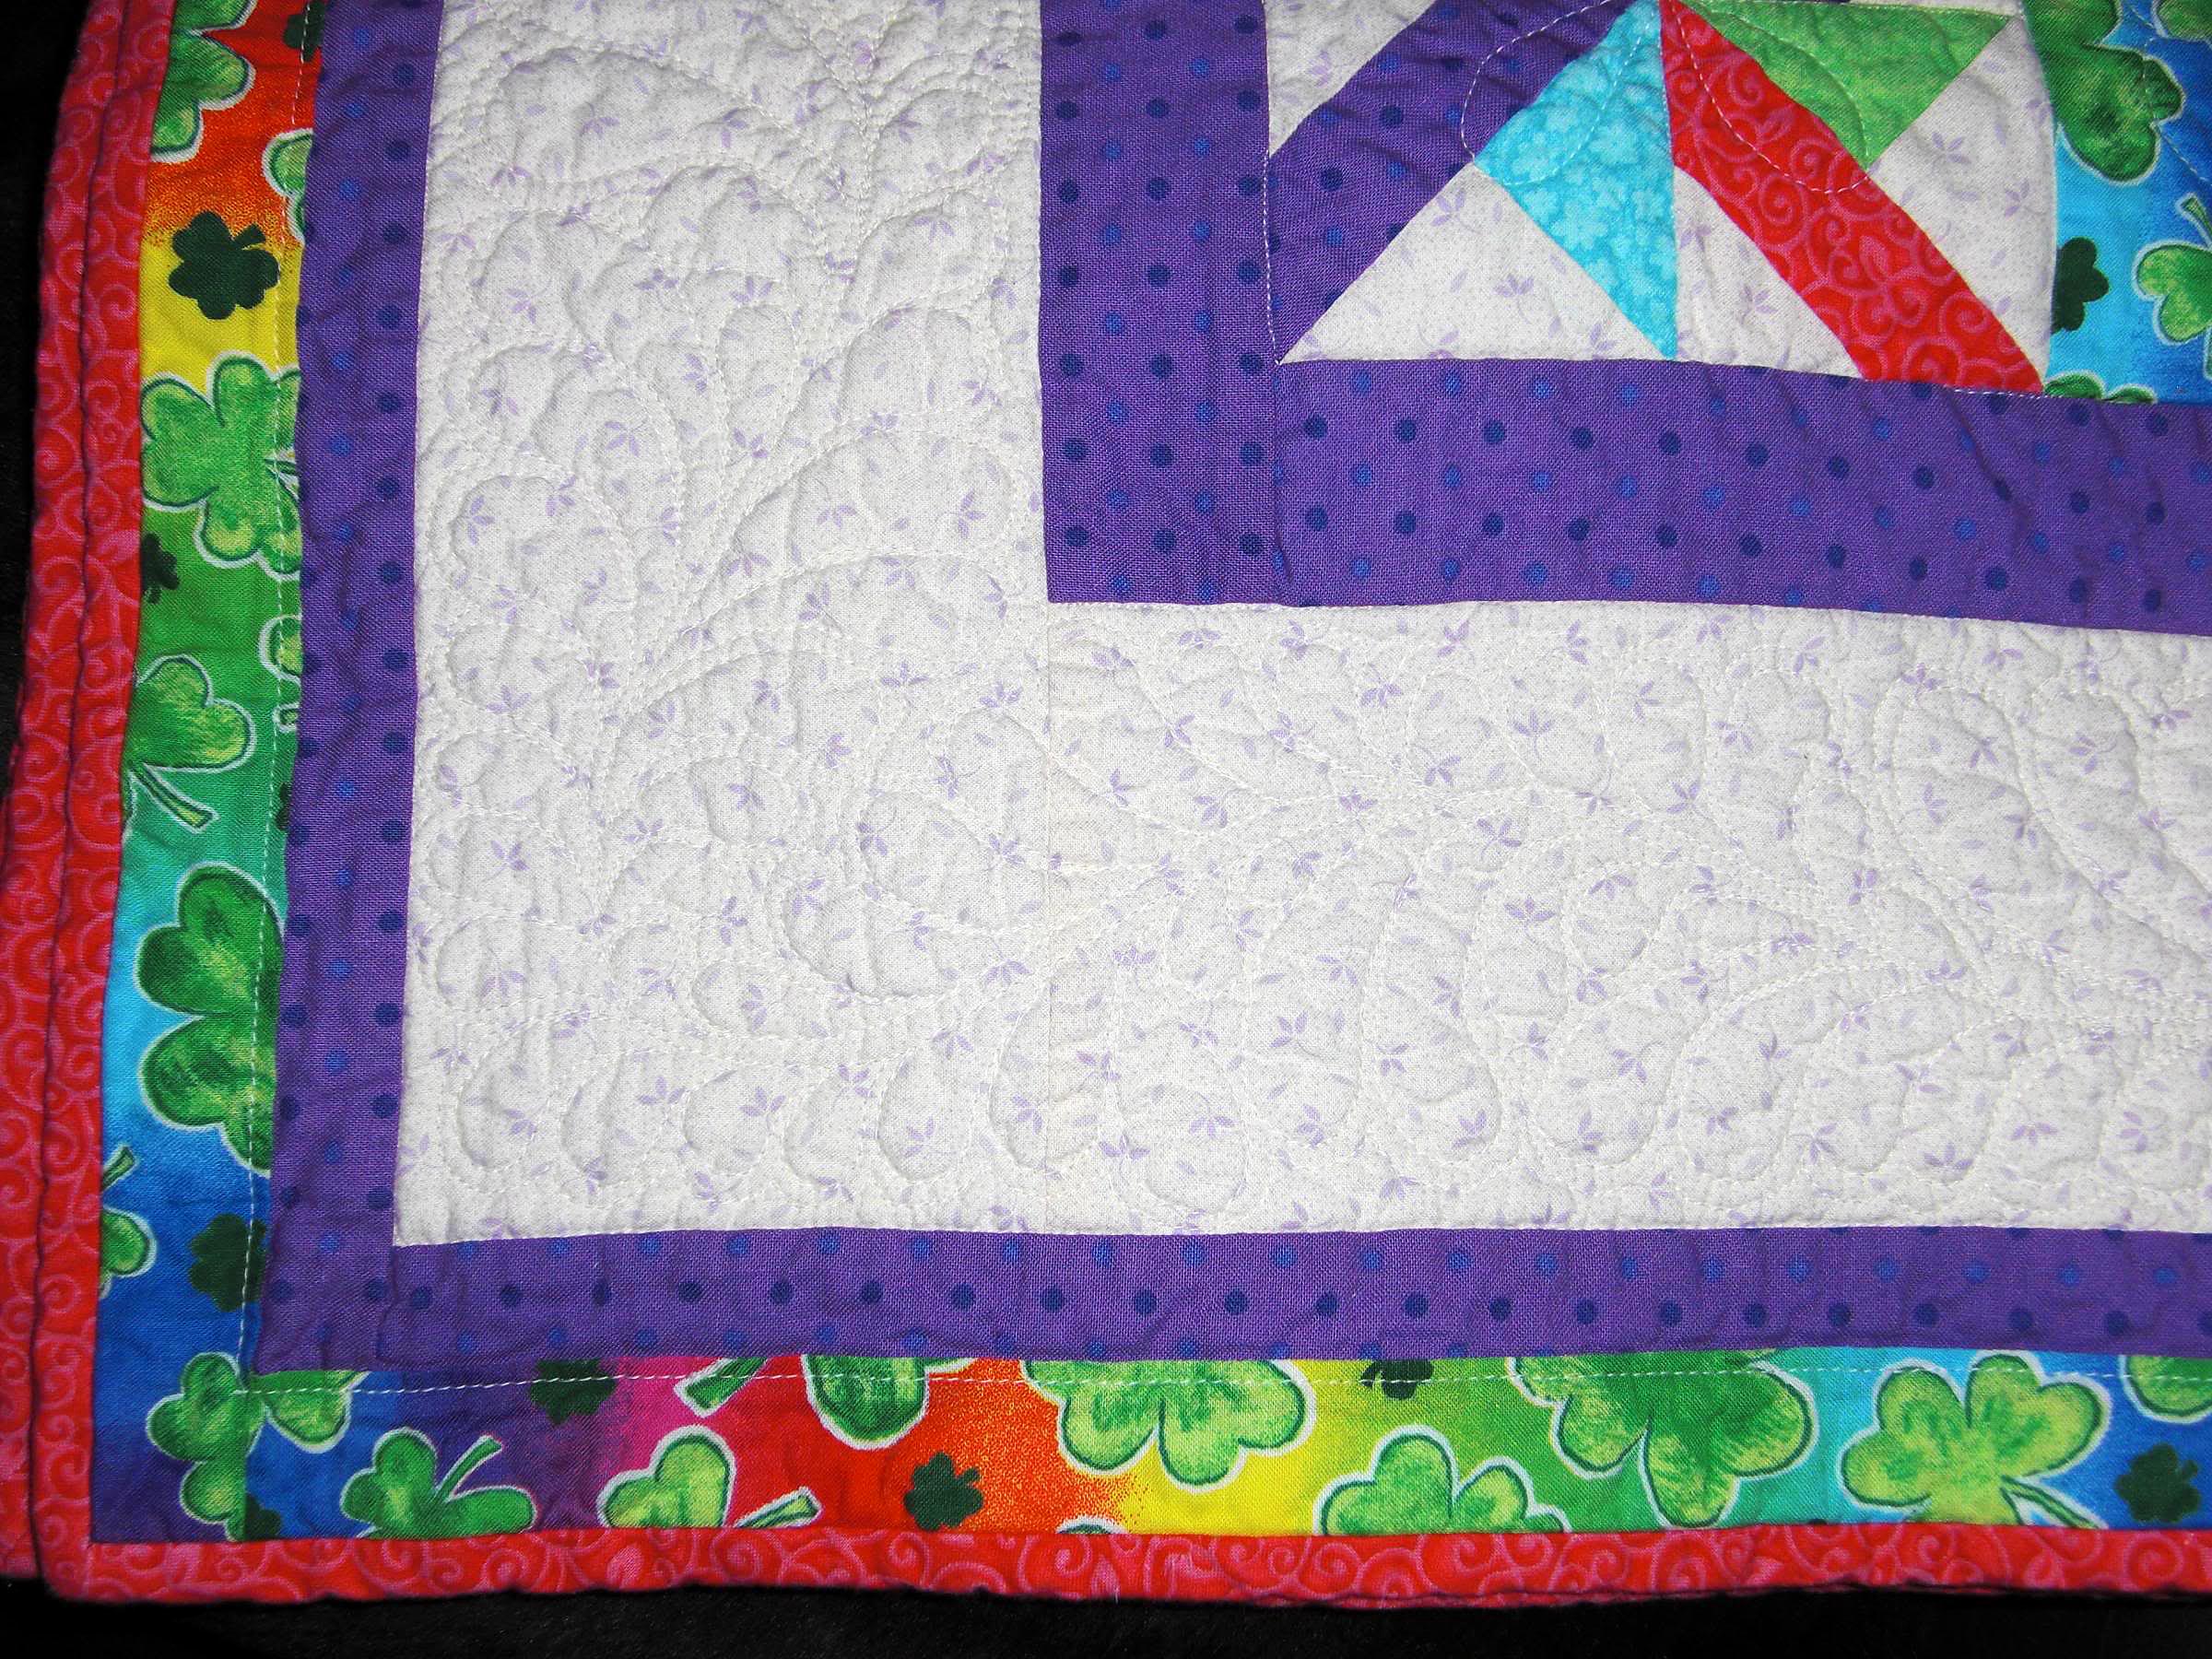 2008 Sep Elizabeth's Shamrock Quilt 2432380050047695897aYALXm_fs.jpg